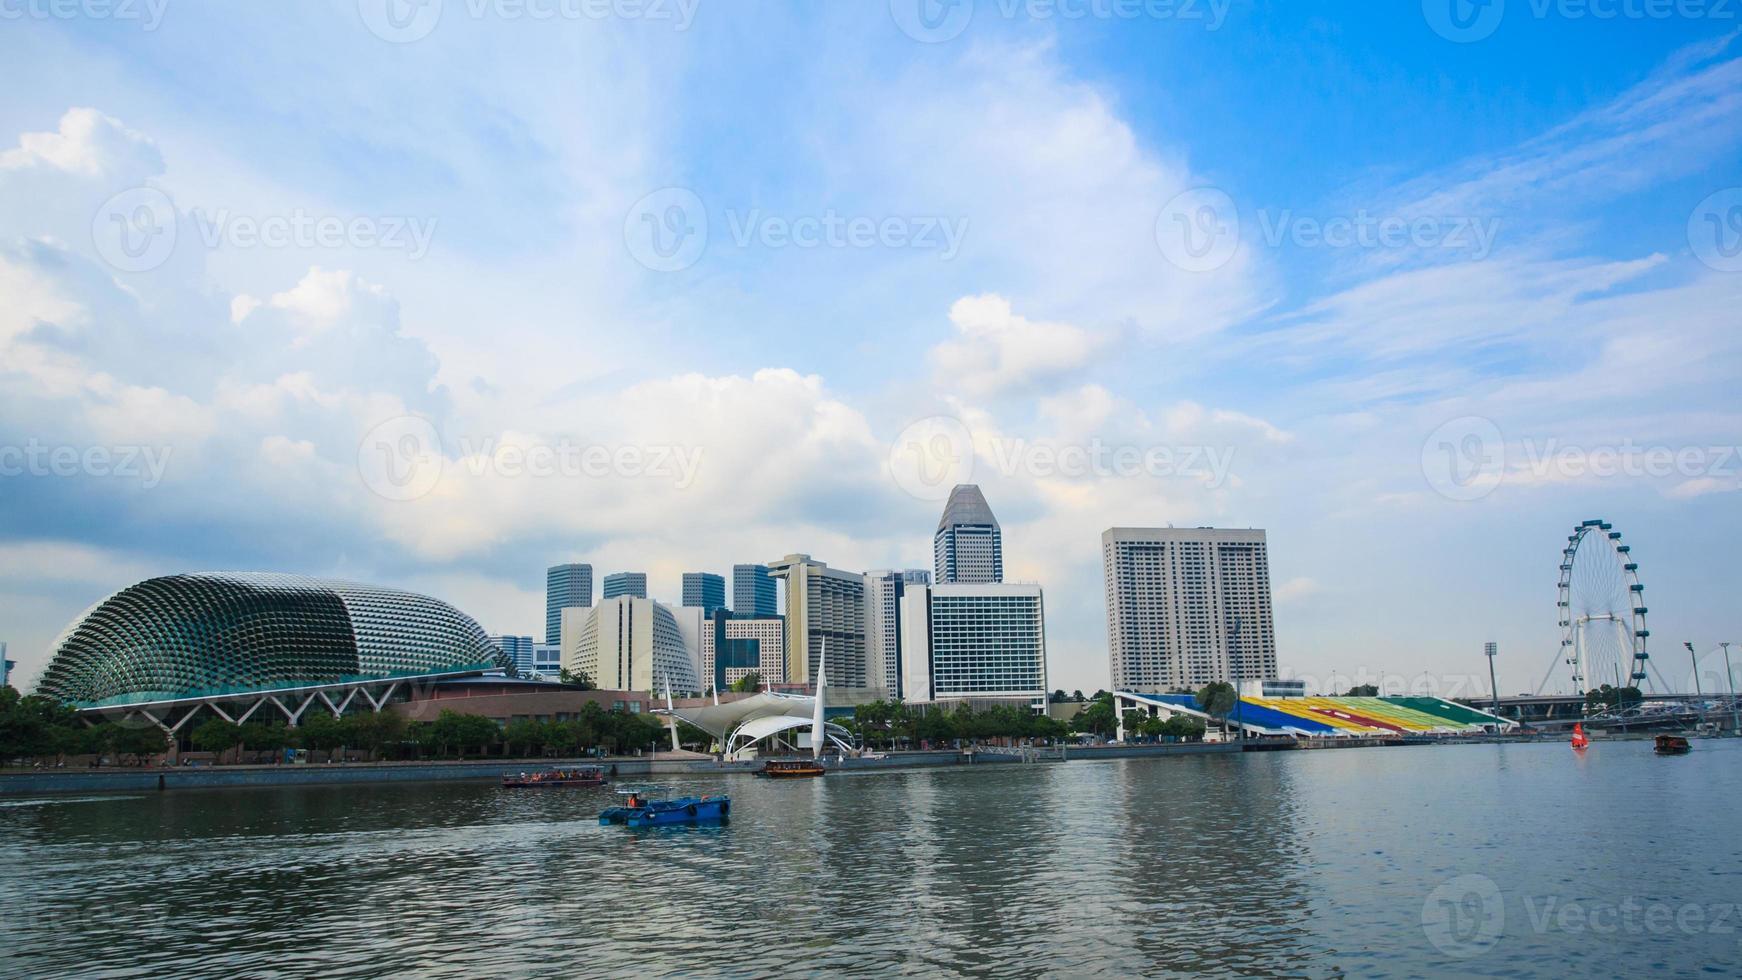 Singapore Esplanade Theatres on the Marina bay photo